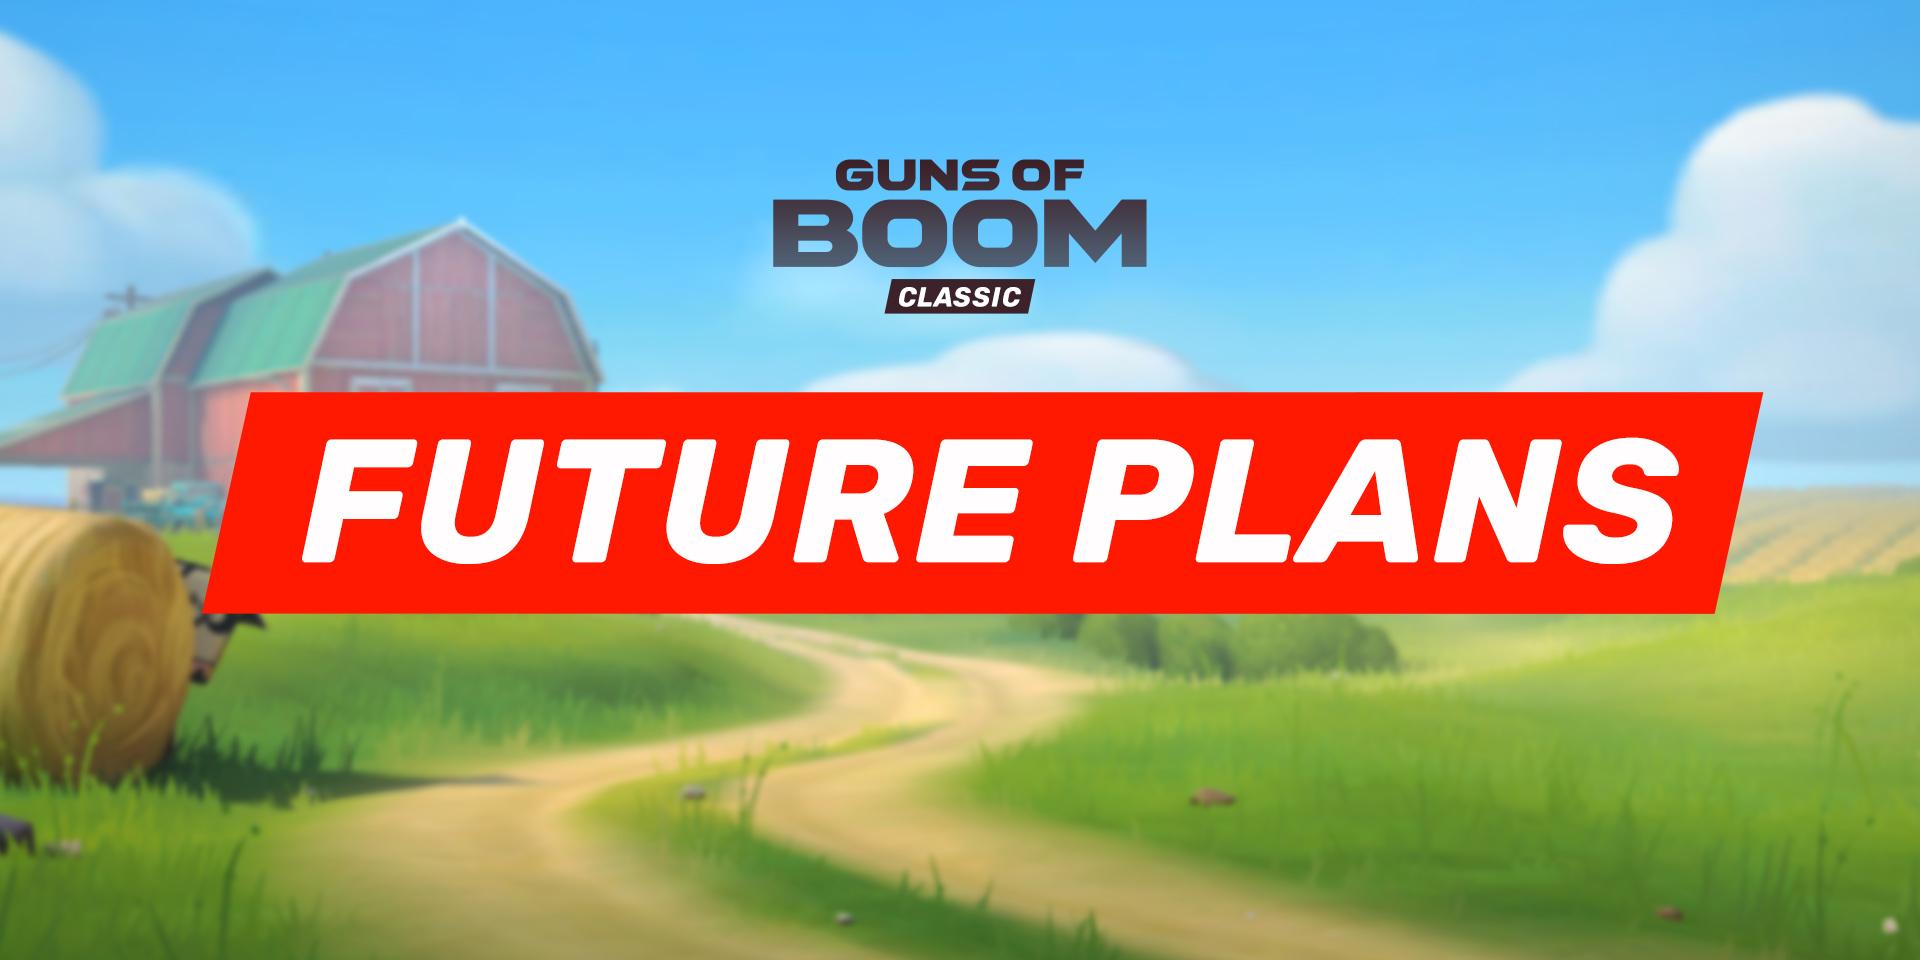 6166a0cee67c8_futureplans-article_header_EN